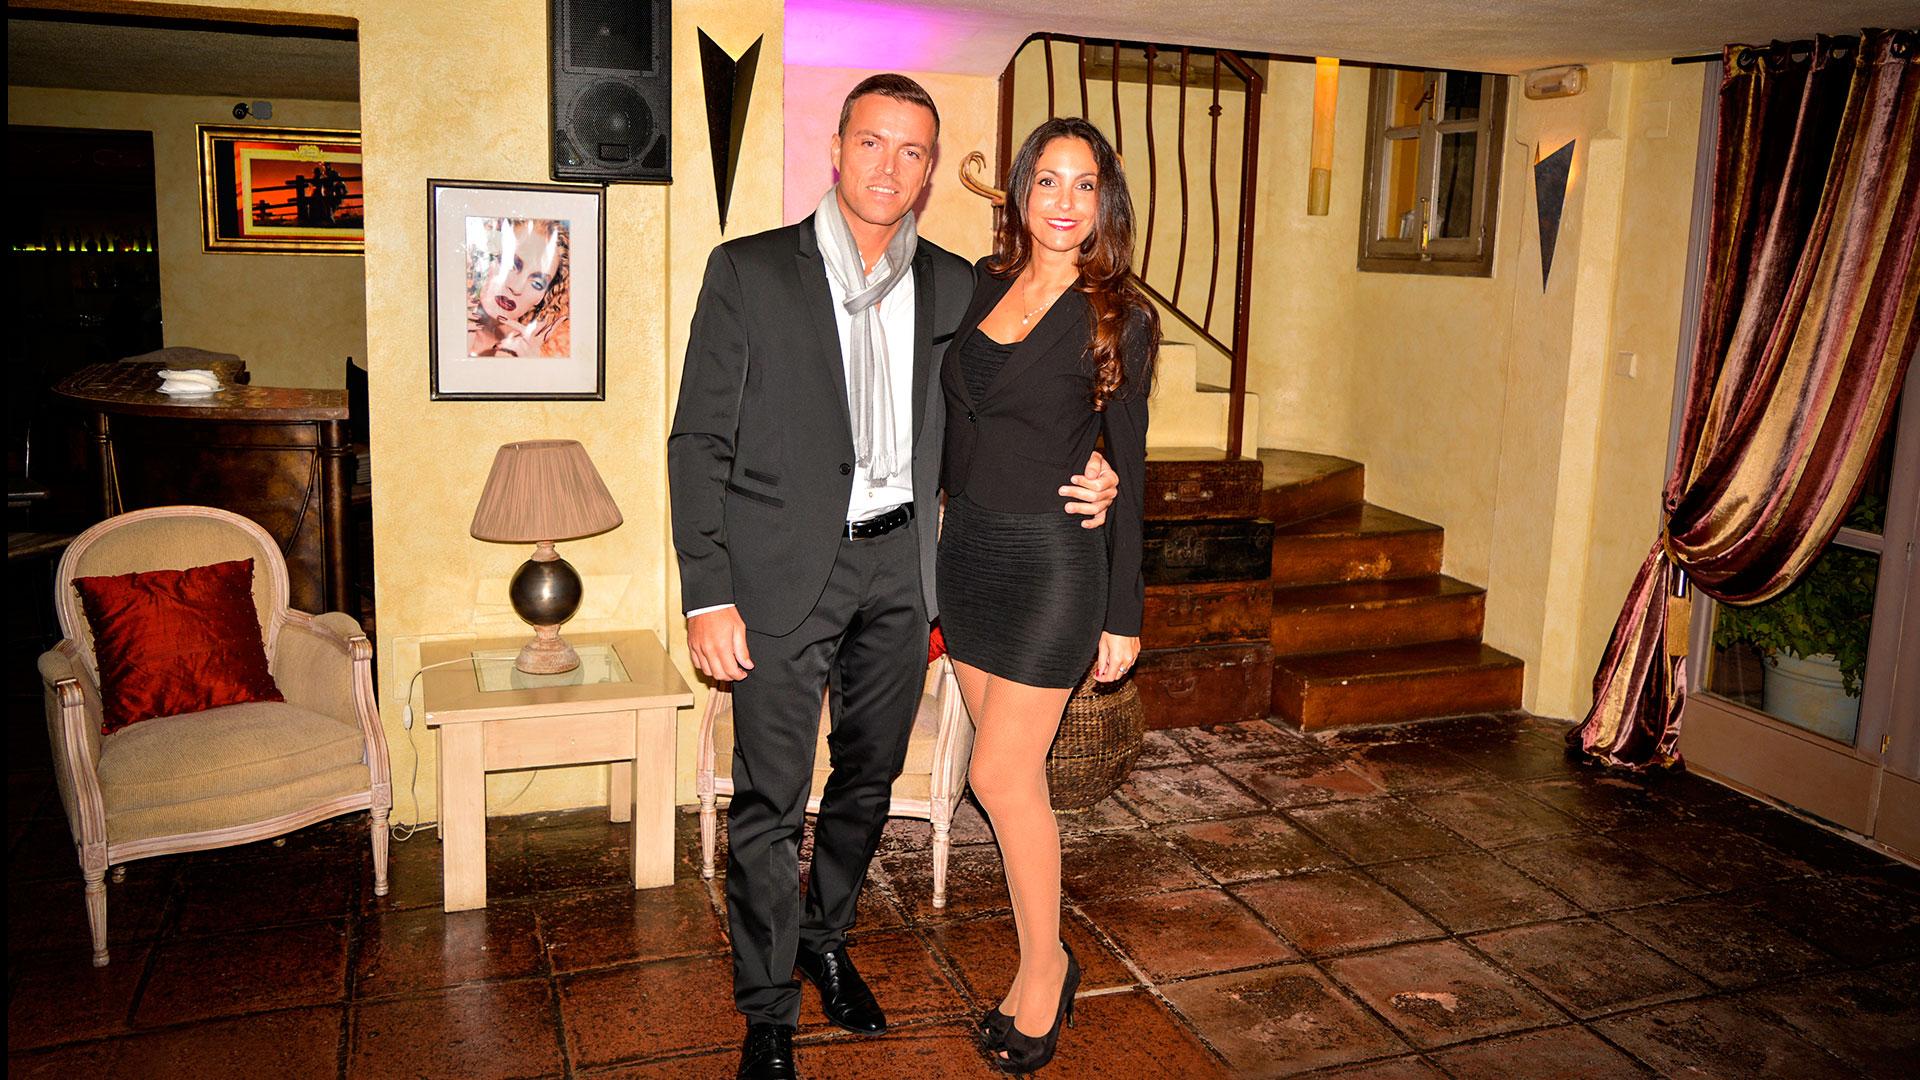 Ariana & Matteo celebrating Ariana's Birthday Party at Finca Besaya - Marbella